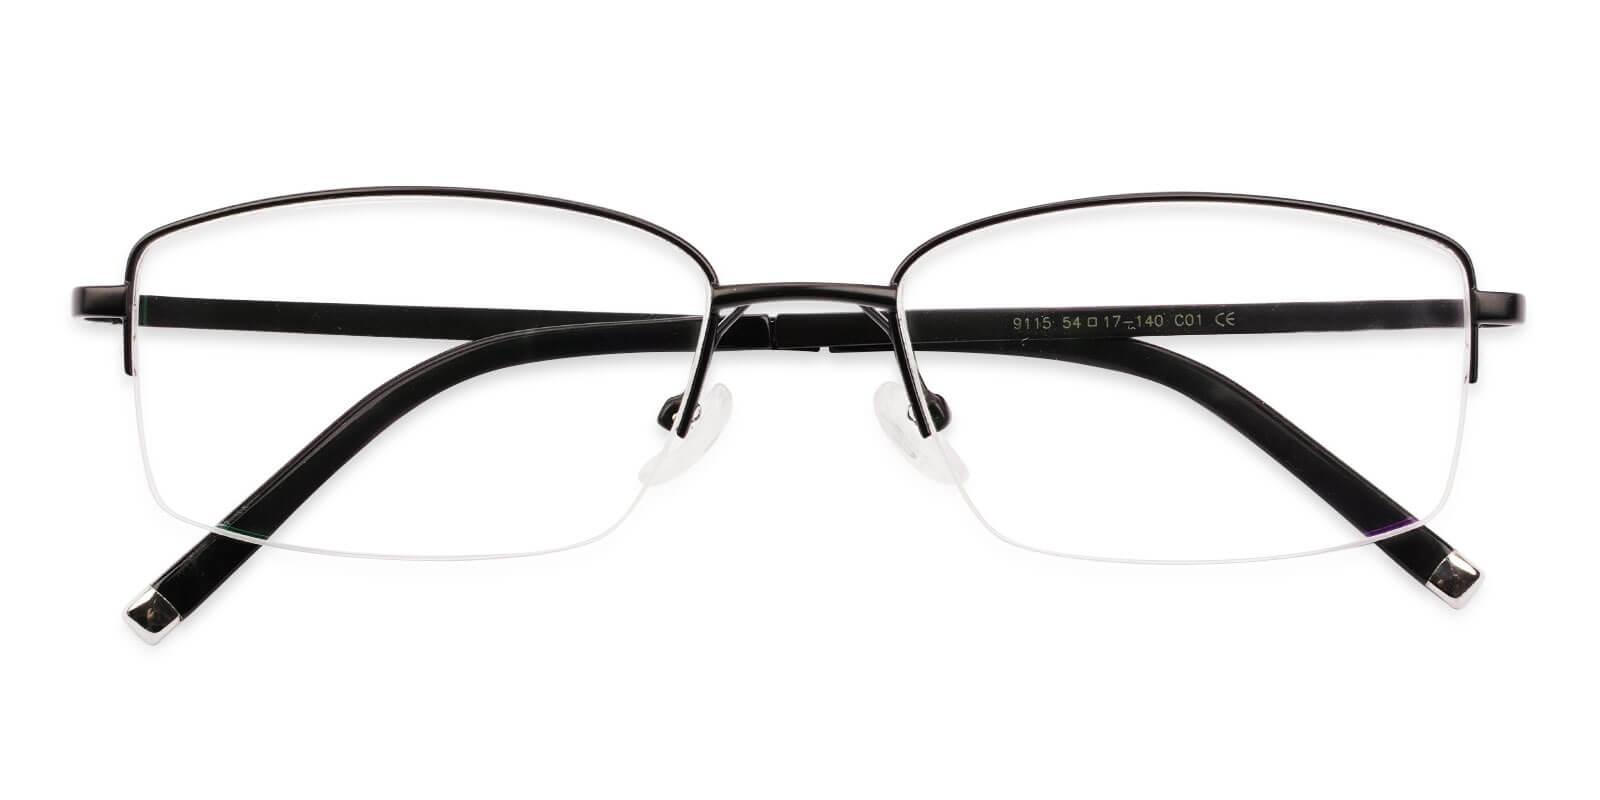 Niger Black Titanium NosePads , Eyeglasses Frames from ABBE Glasses